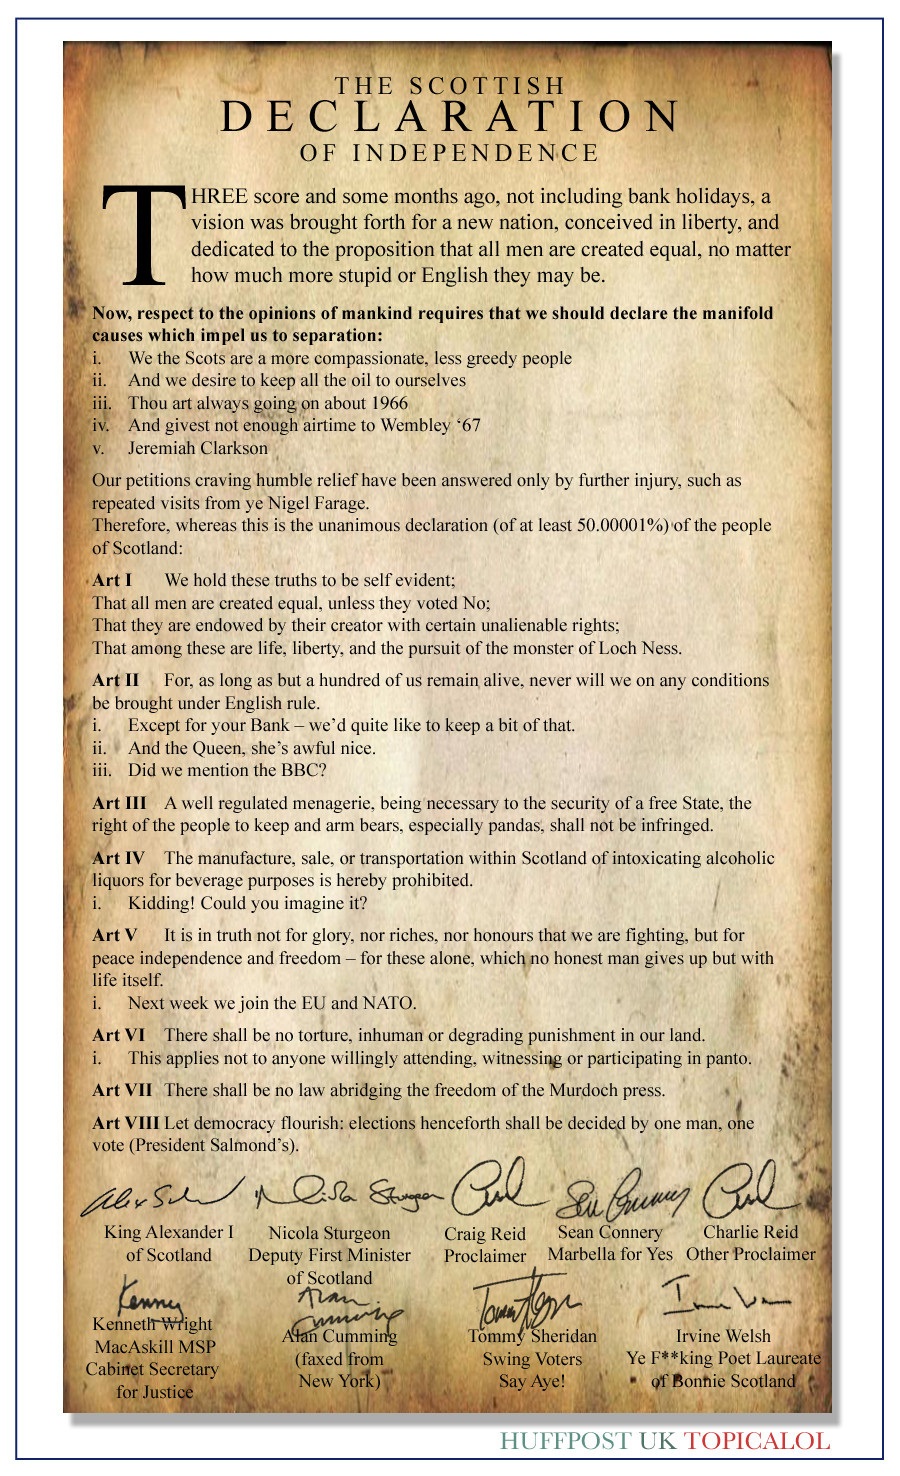 REVEALED: The Scottish Declaration Of Independence